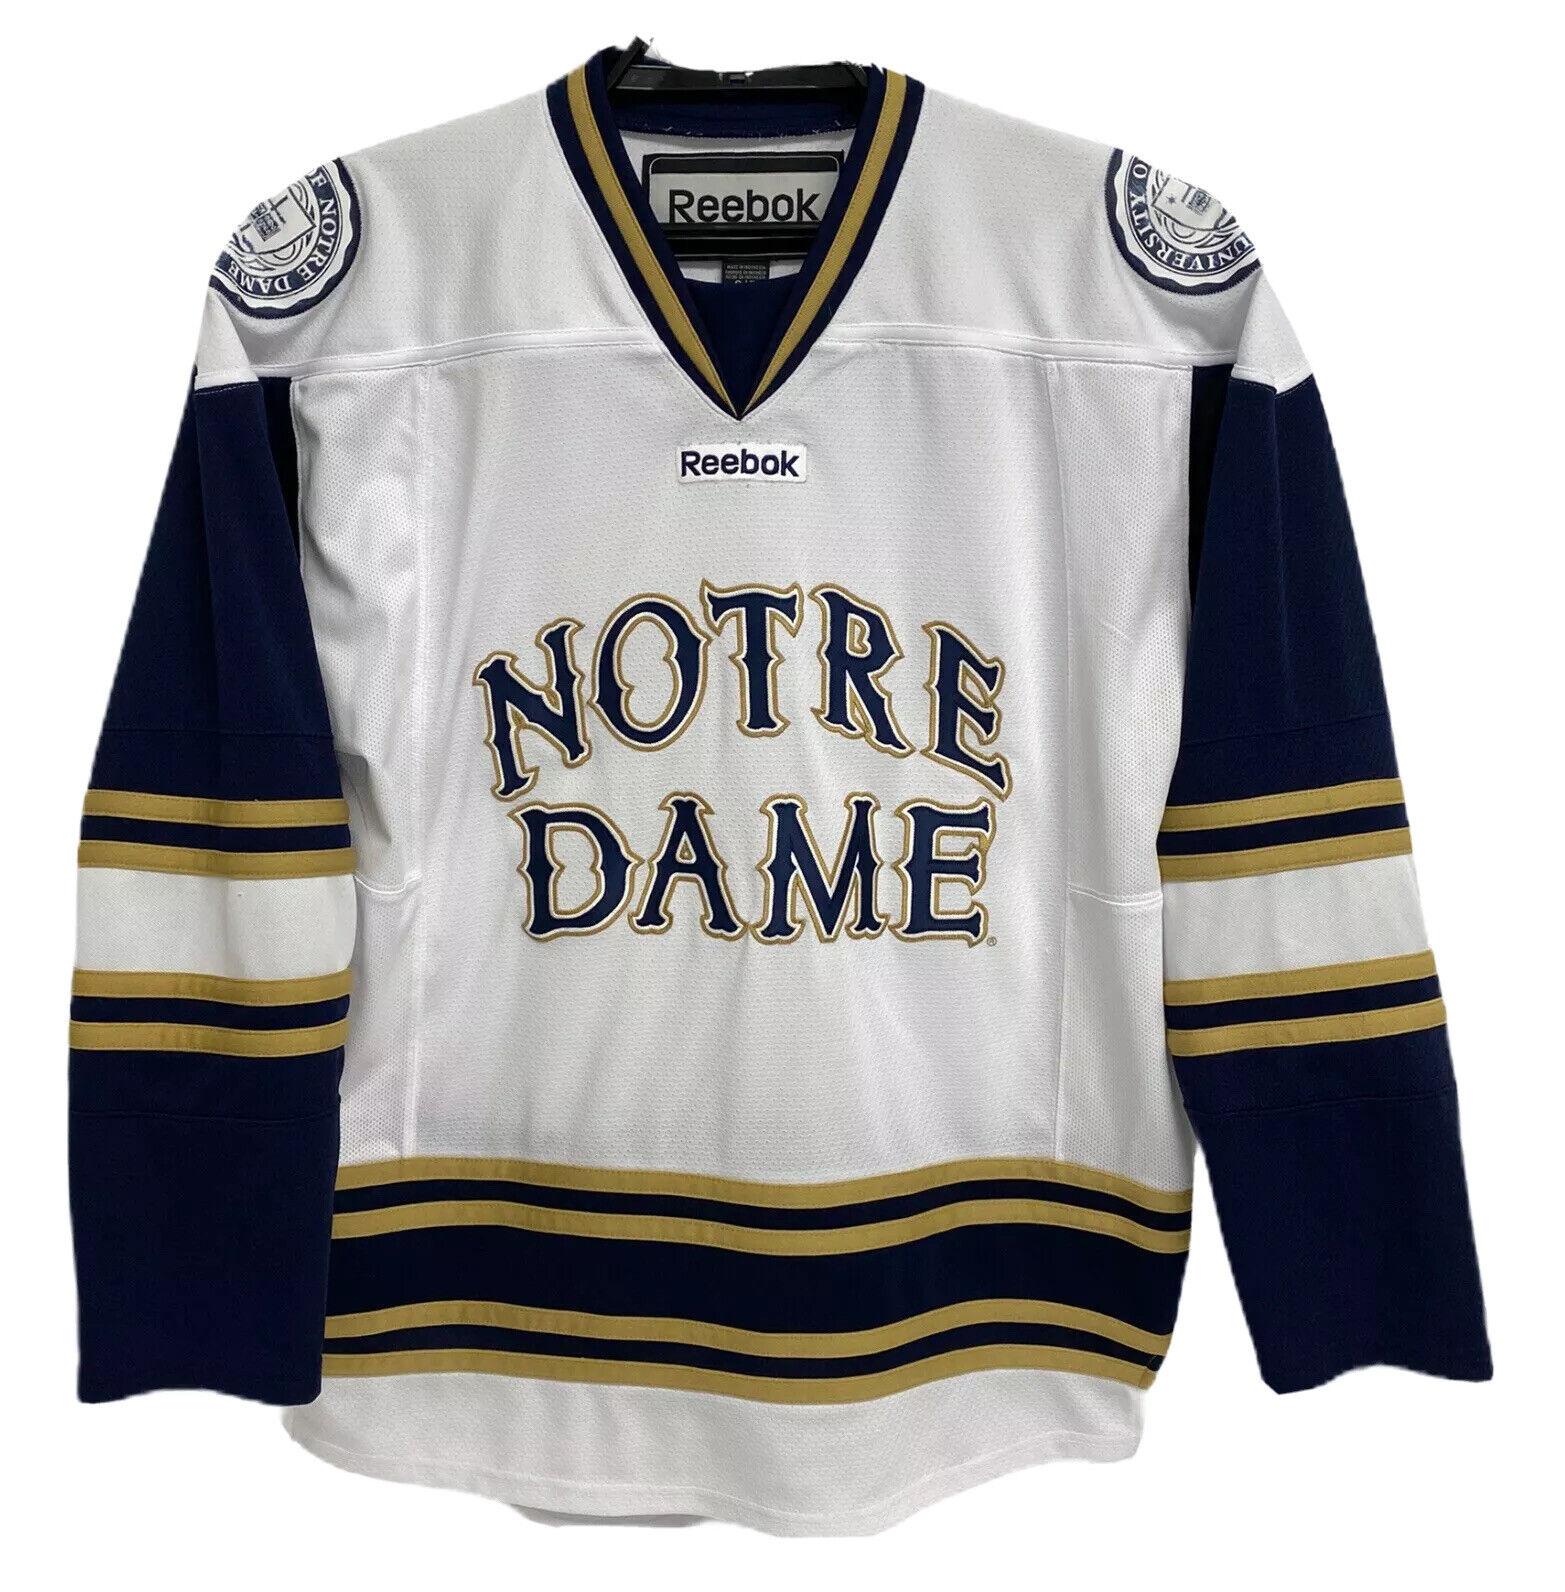 Reebok Notre Dame Fighting Irish Hockey Jersey Adult Size S